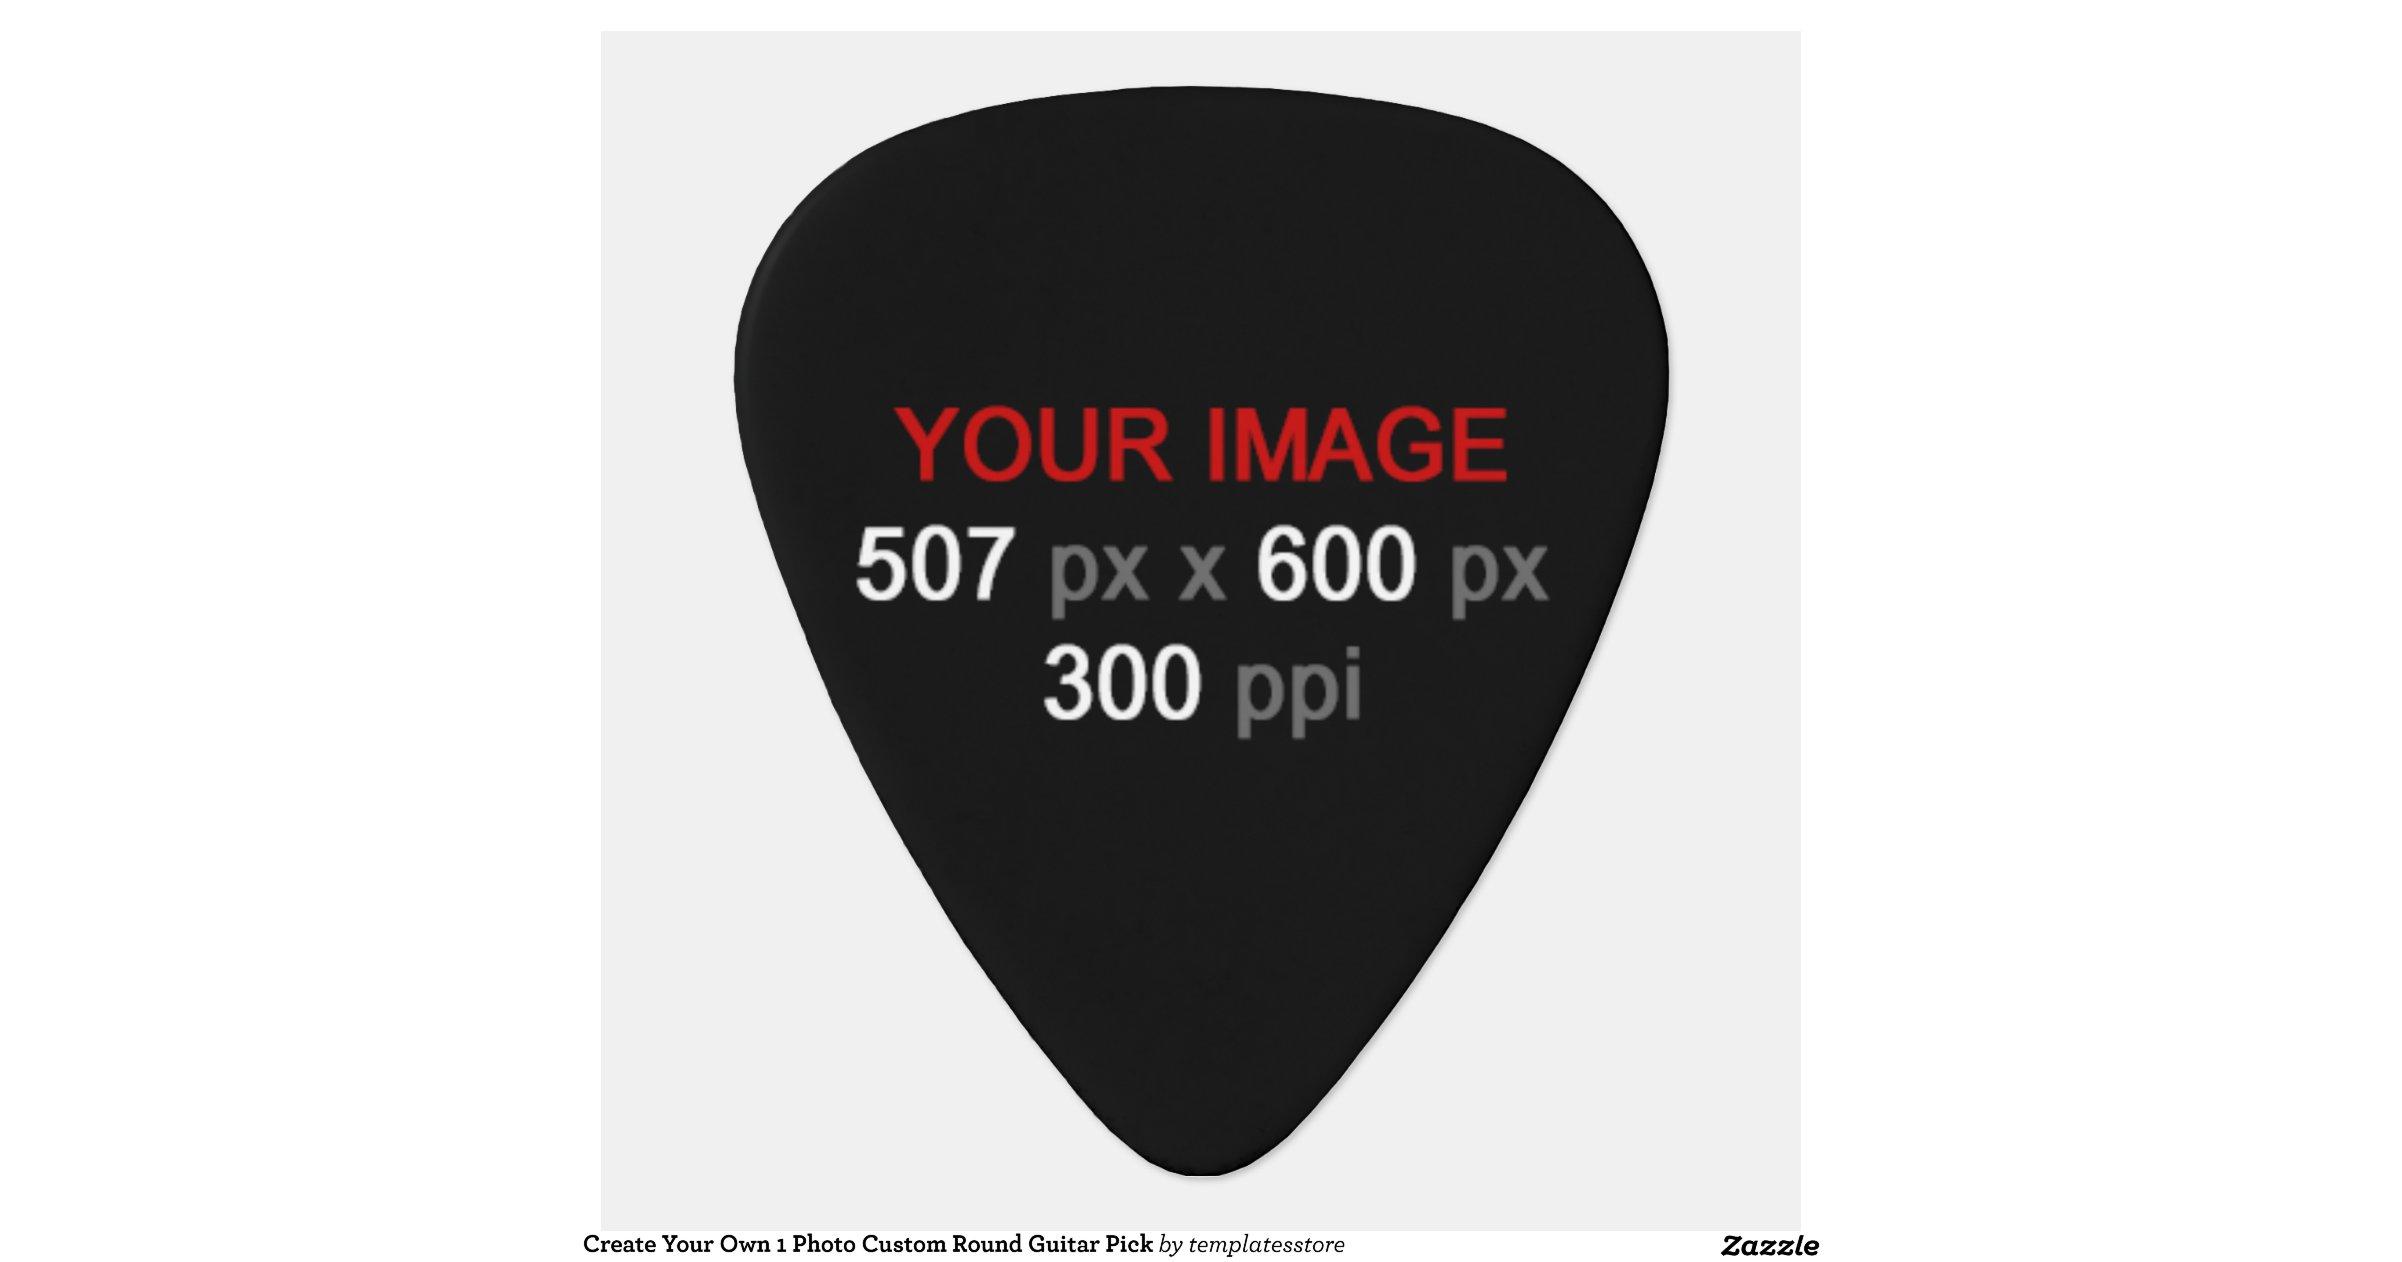 Create Your Own 1 Photo Custom Round Guitar Pick